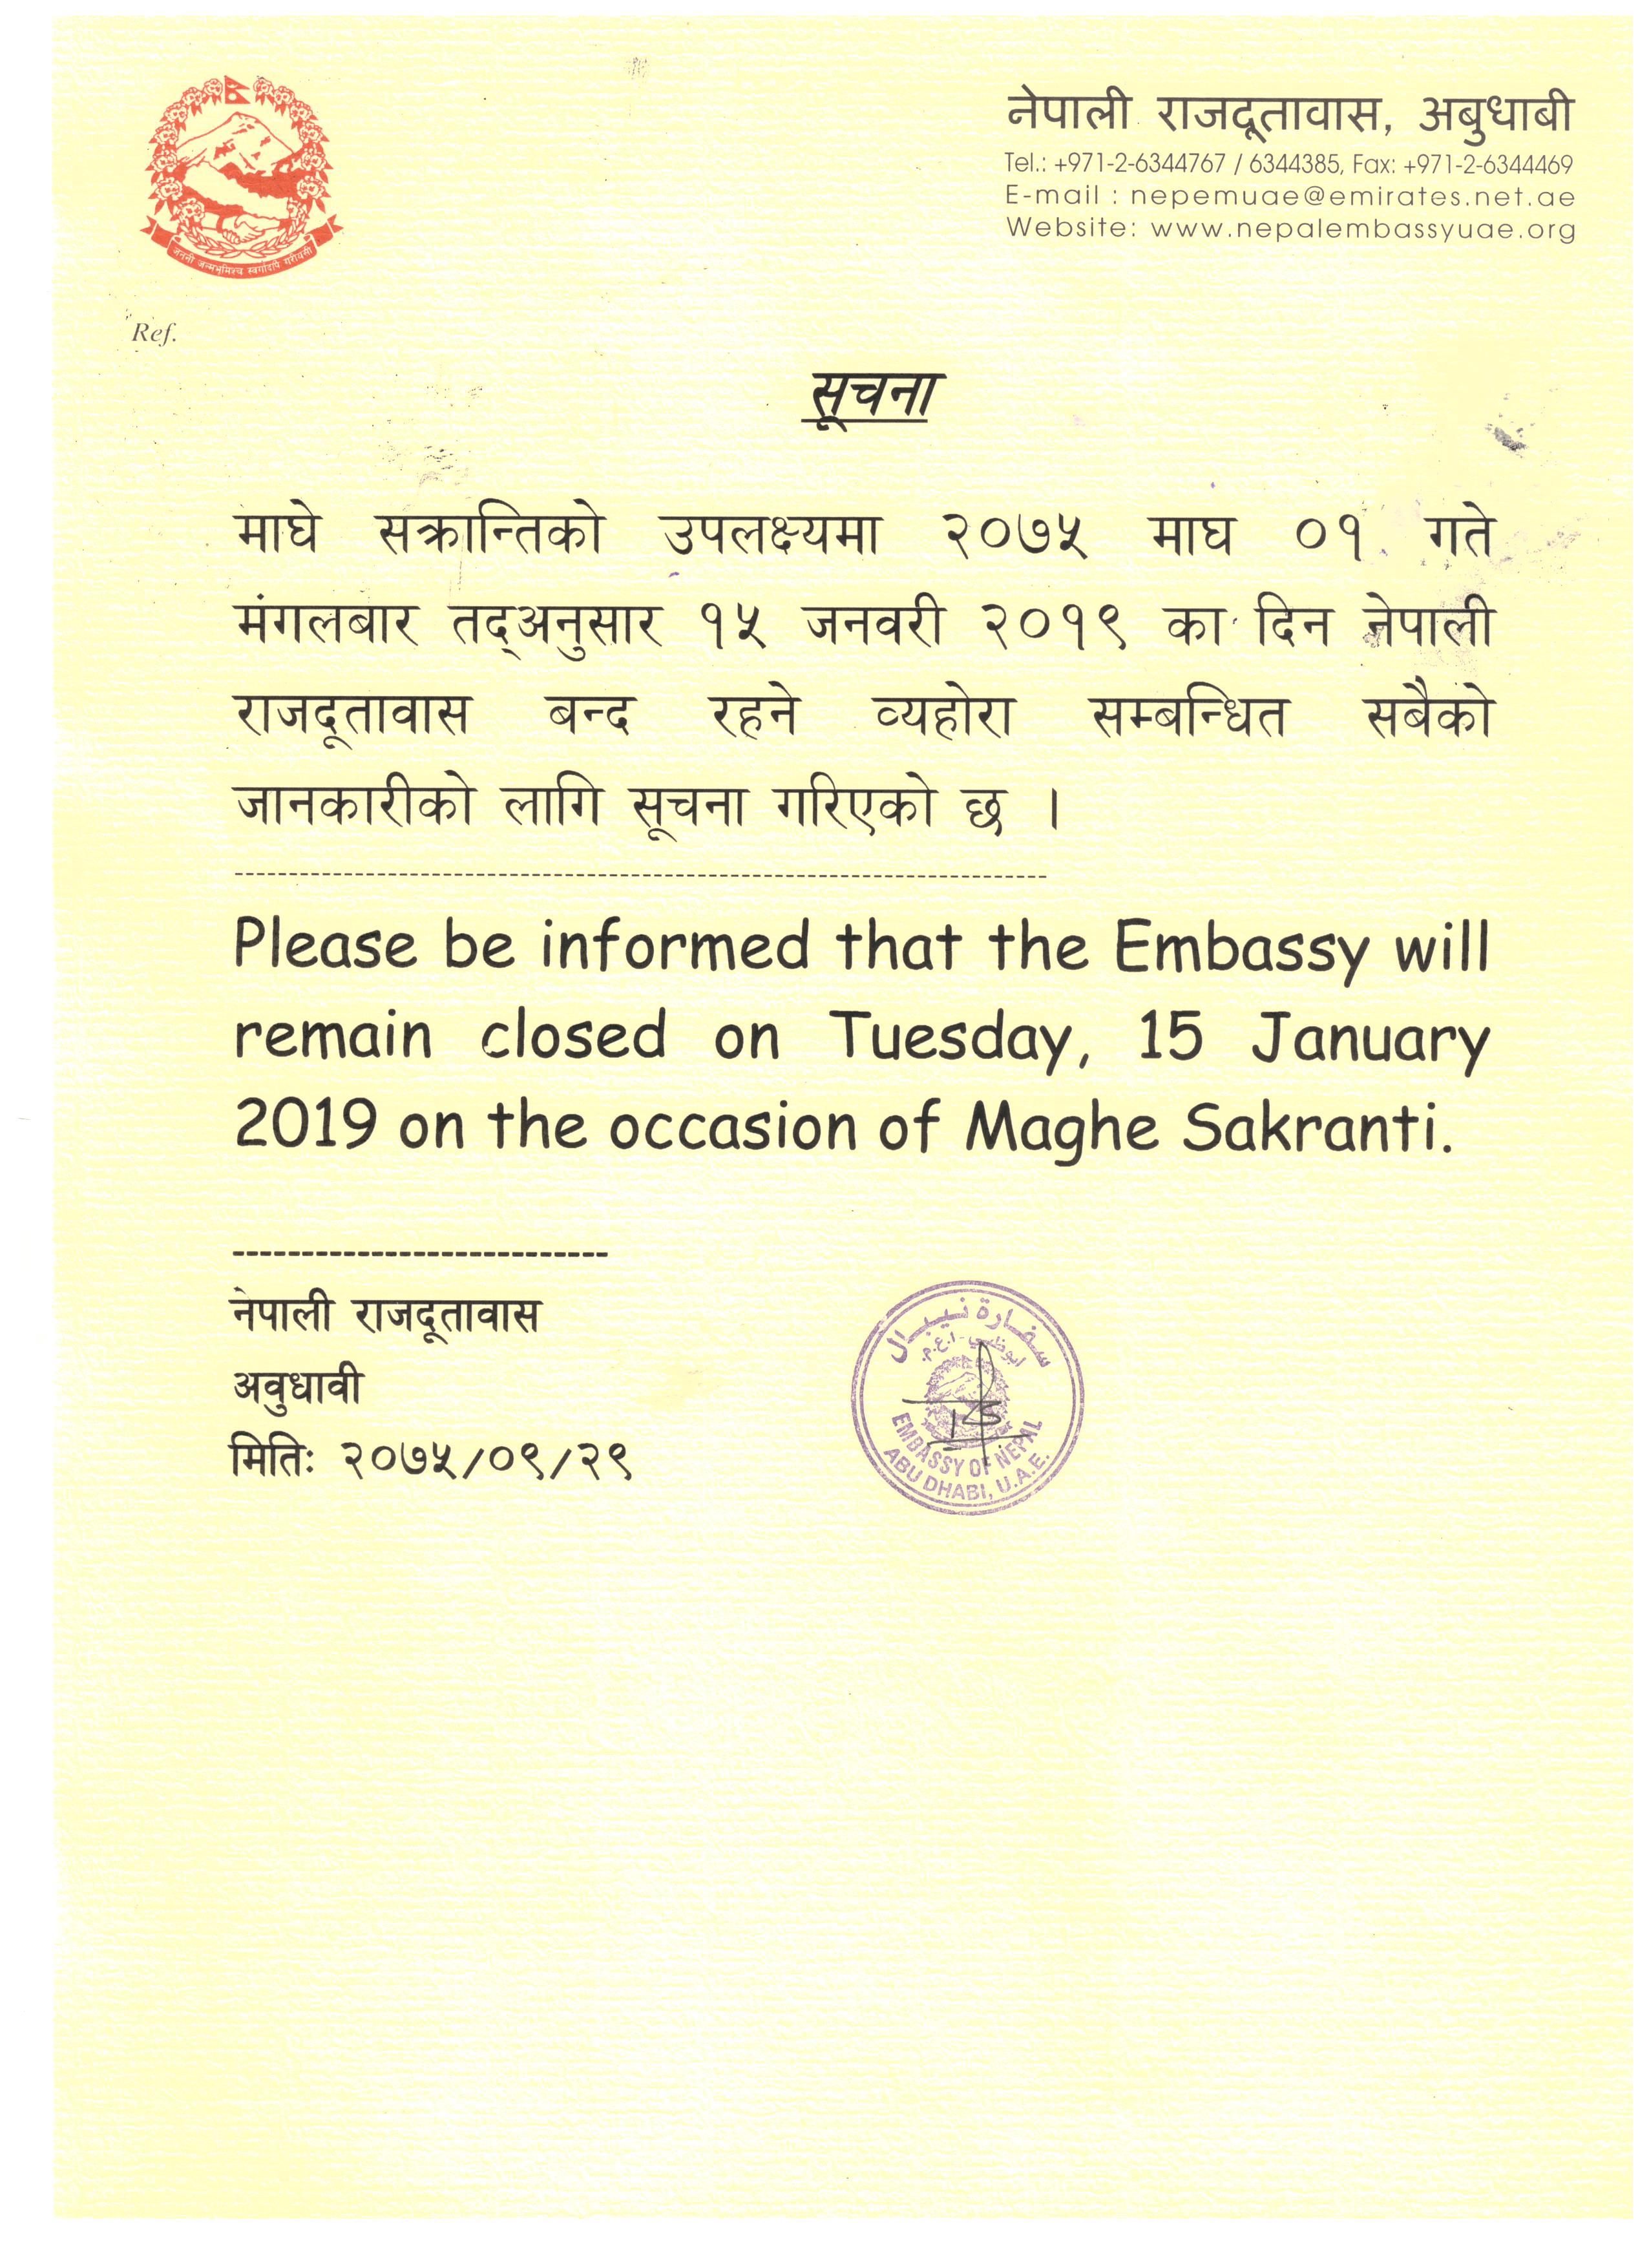 2019-01-13 004 - Embassy of Nepal - Abu Dhabi, UAE